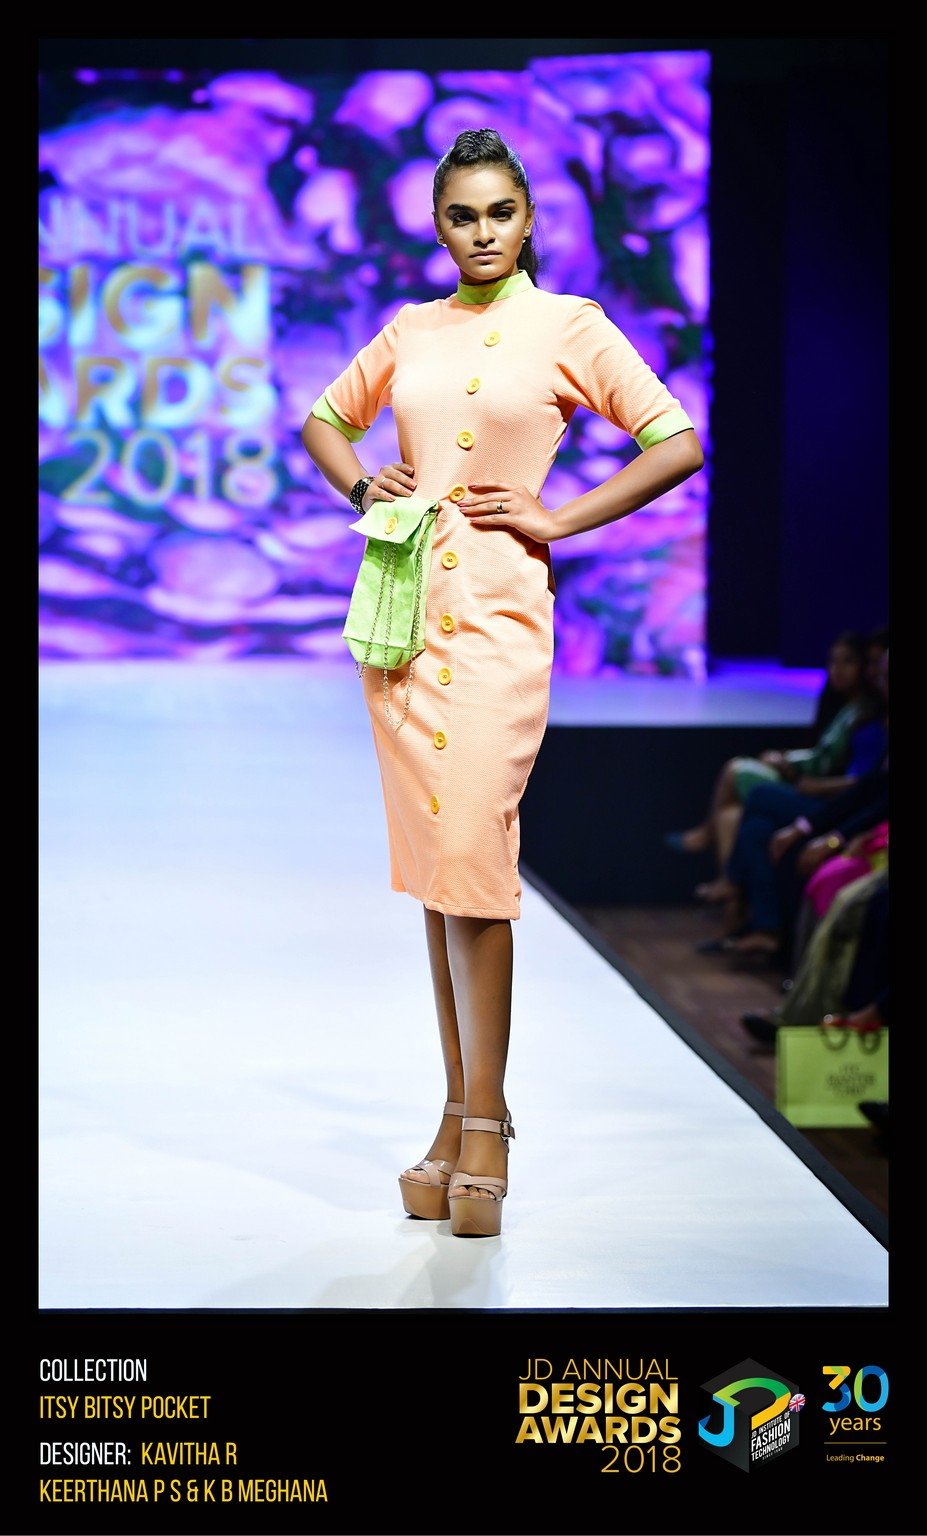 Itsy Bitsy Pocket Dress – Change – JD Annual Design Awards 2018   Designer: Kavitha, Keertana and Meghana   Photography : Jerin Nath (@jerin_nath) itsy bitsy pocket dress - ITSY BITSY POCKET4 - Itsy Bitsy Pocket Dress – Change – JD Annual Design Awards 2018